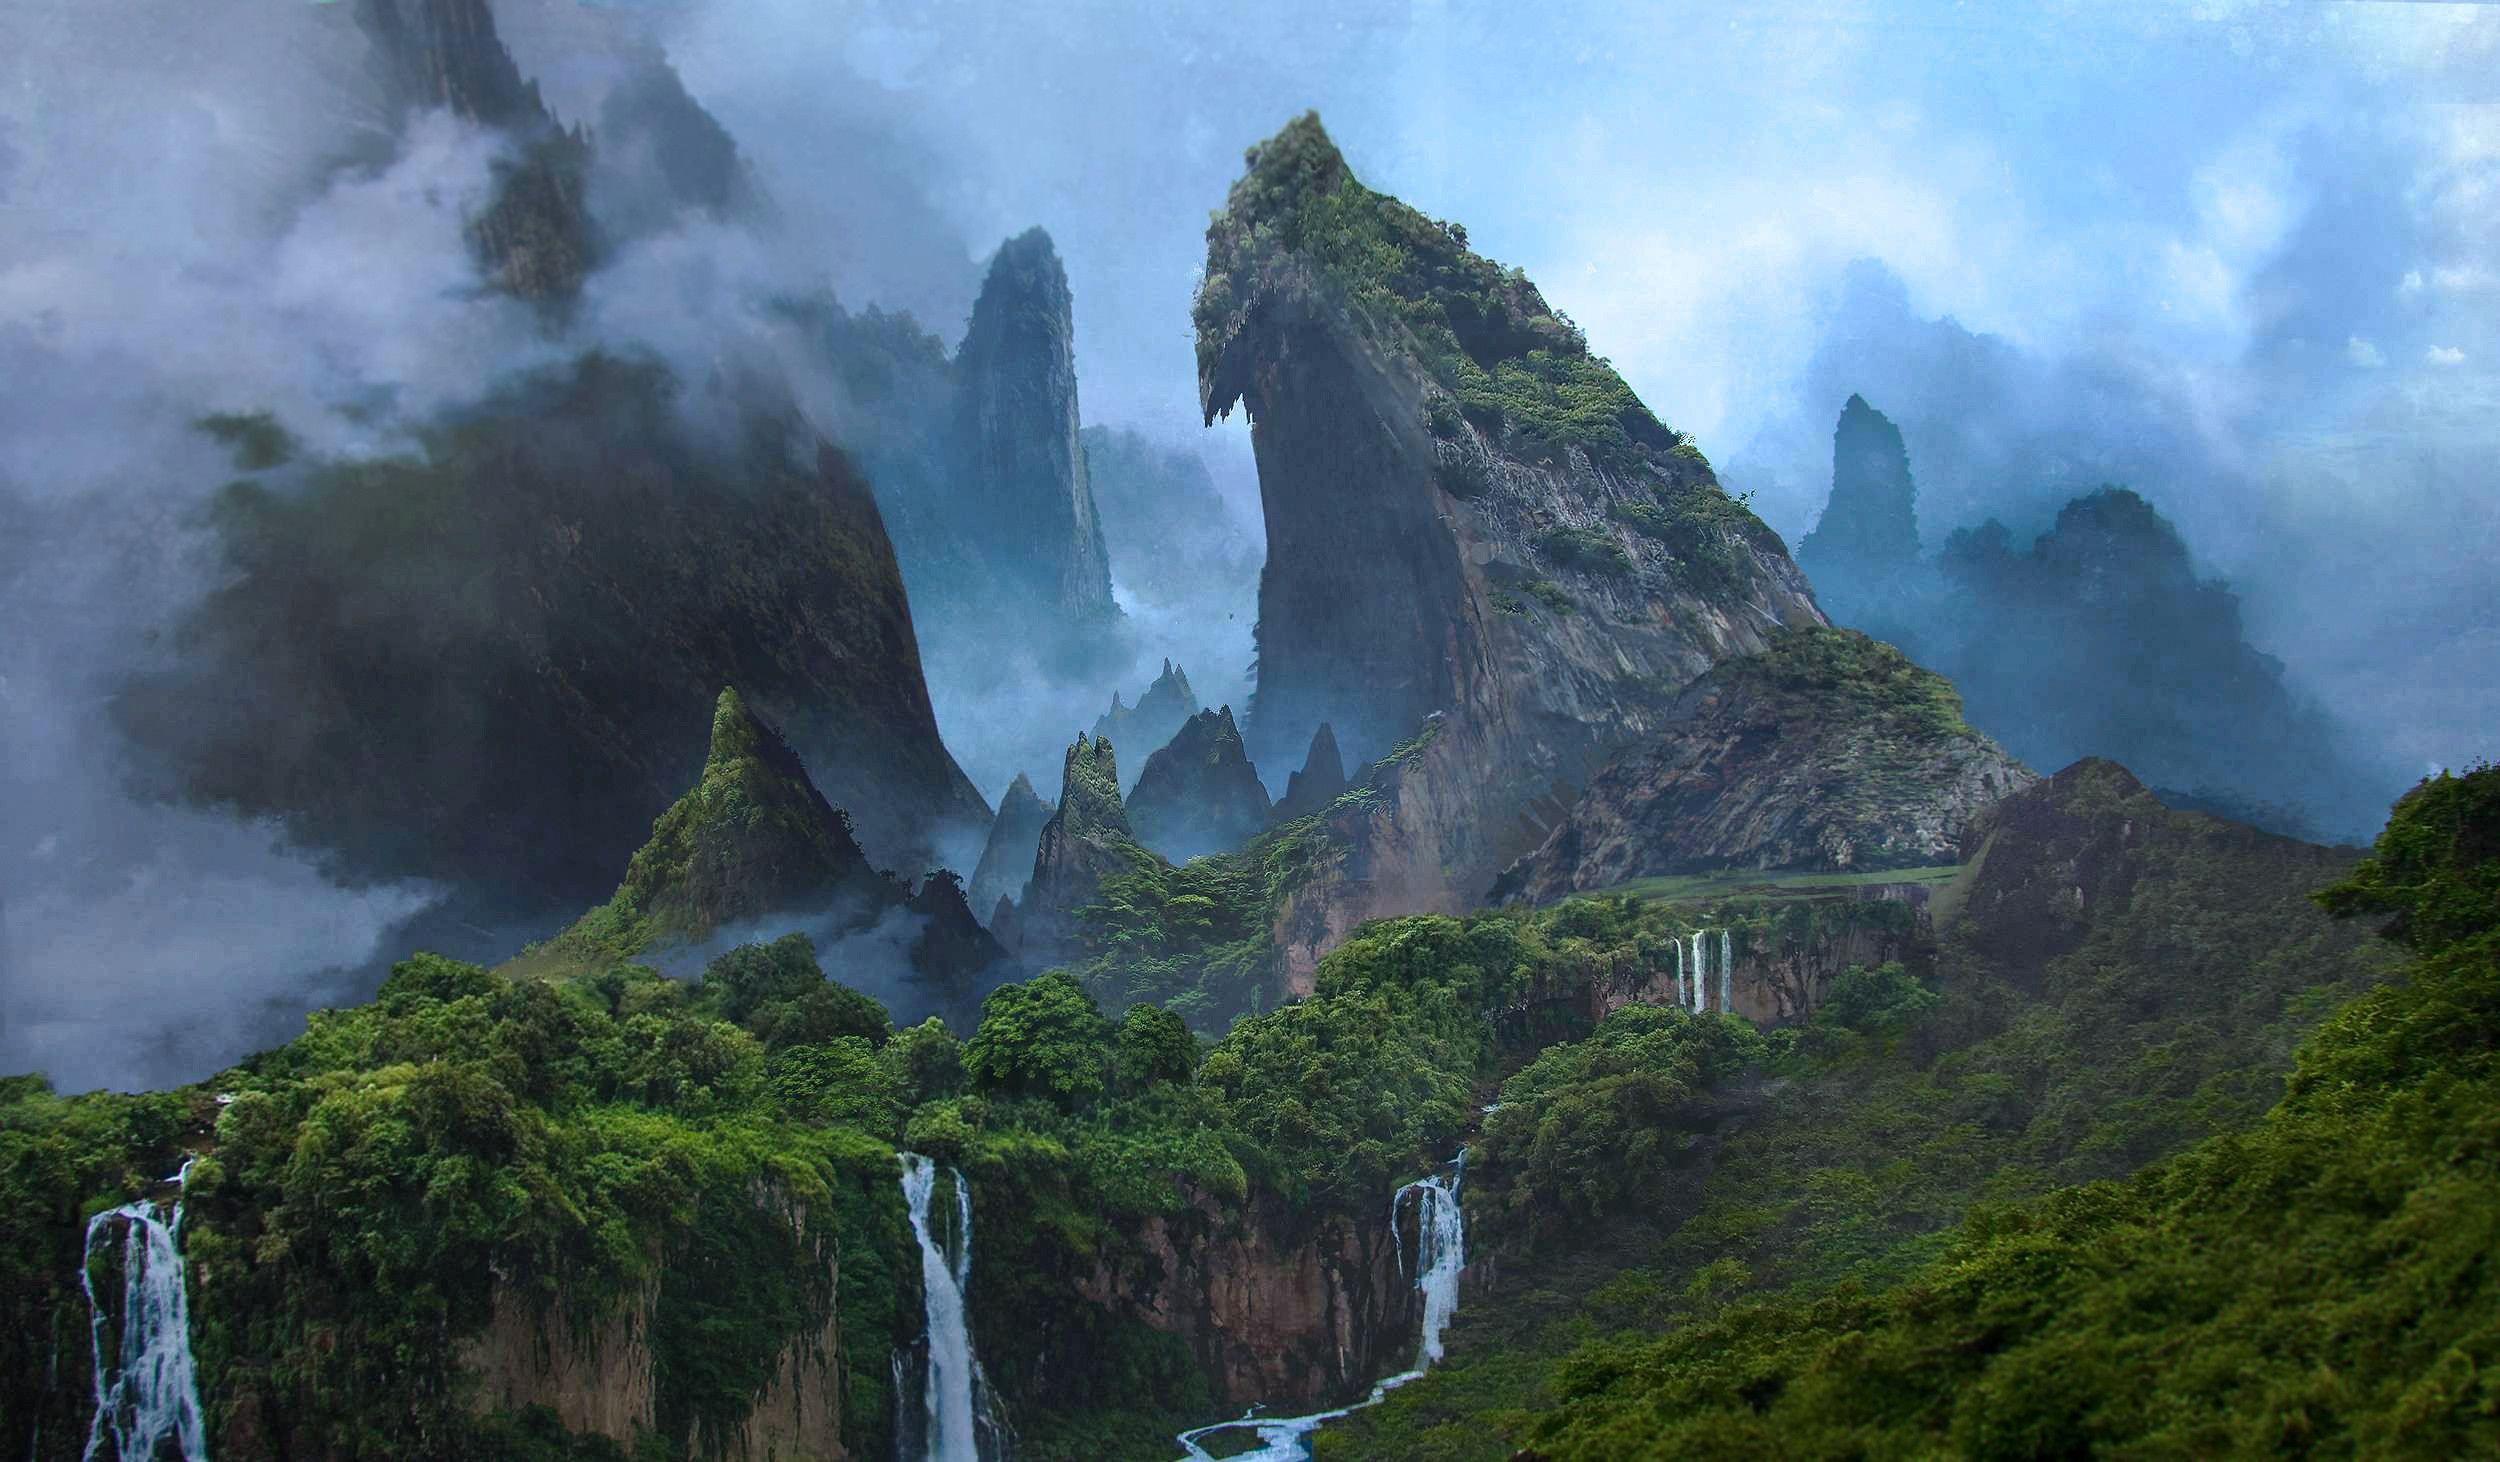 Madagascar Landscape Wallpapers Top Free Madagascar